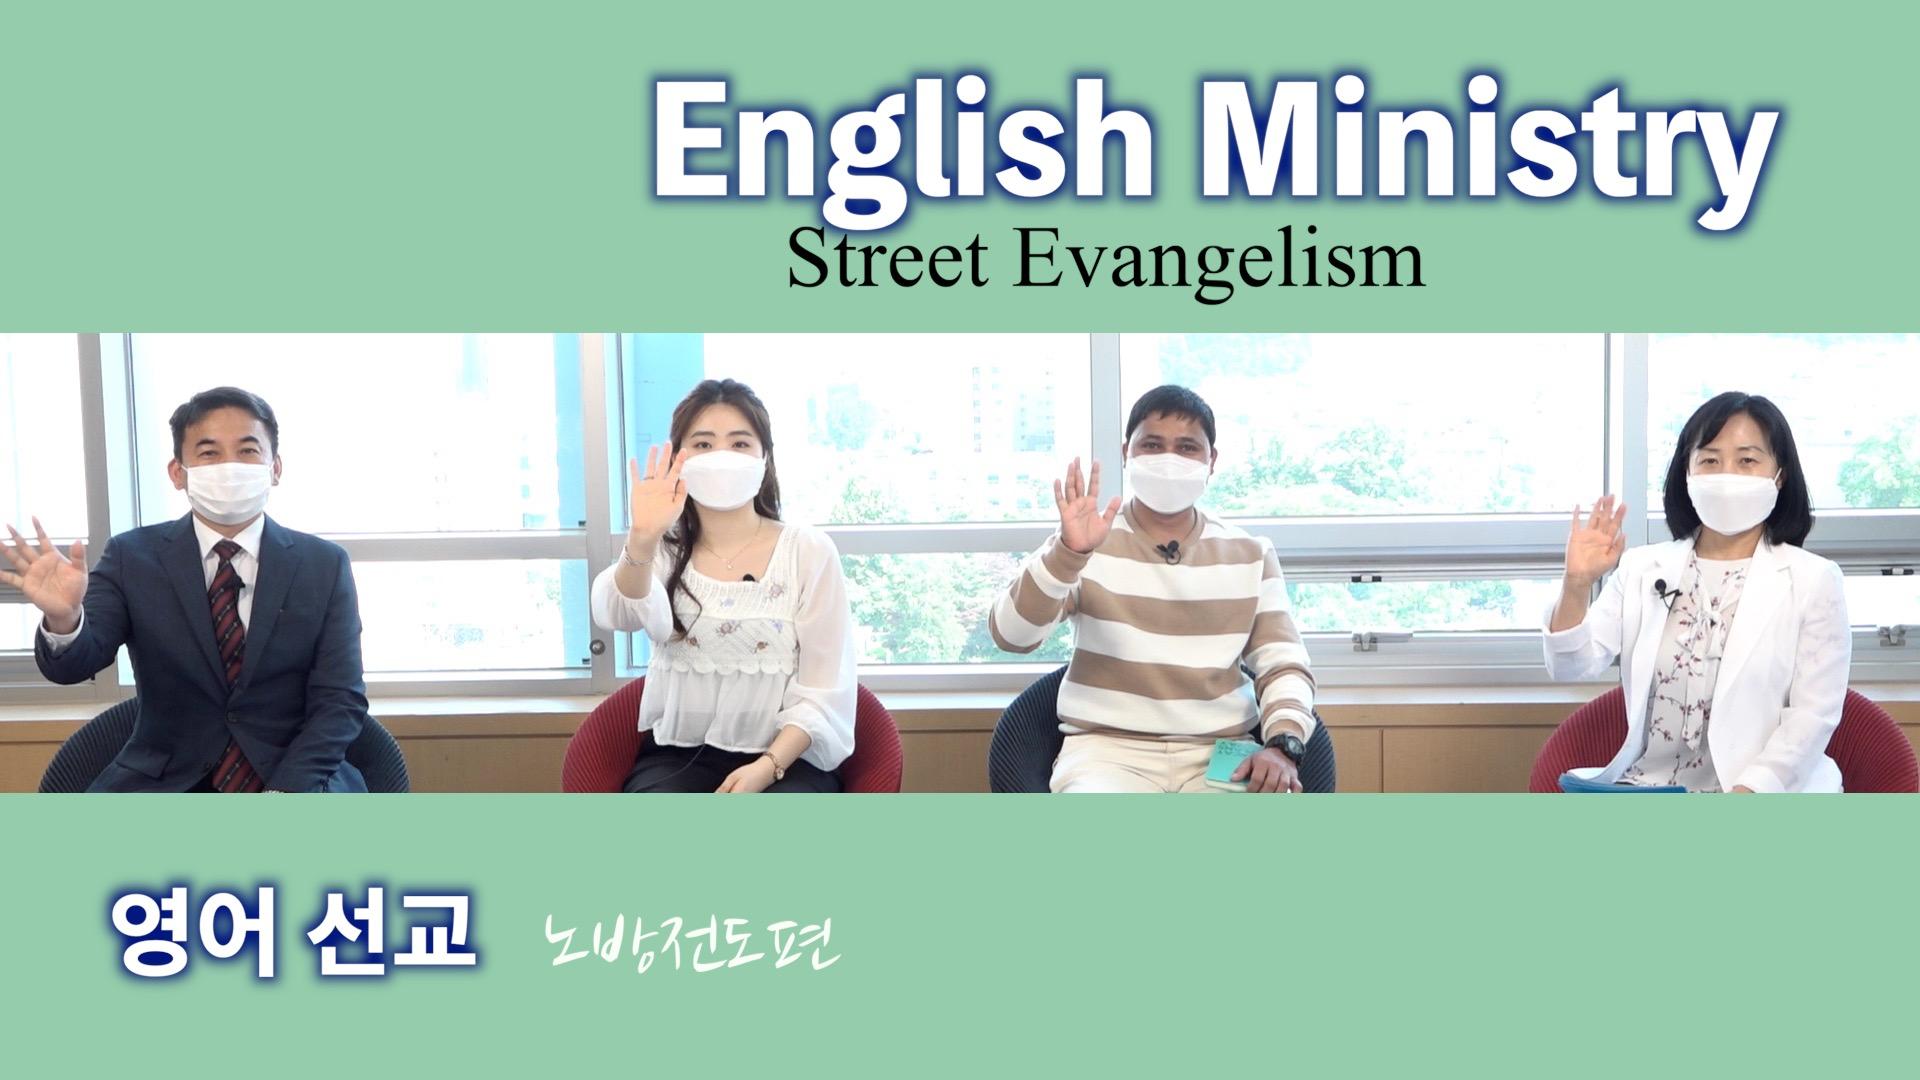 Leena's Bible English-English Ministry Street Evangelism